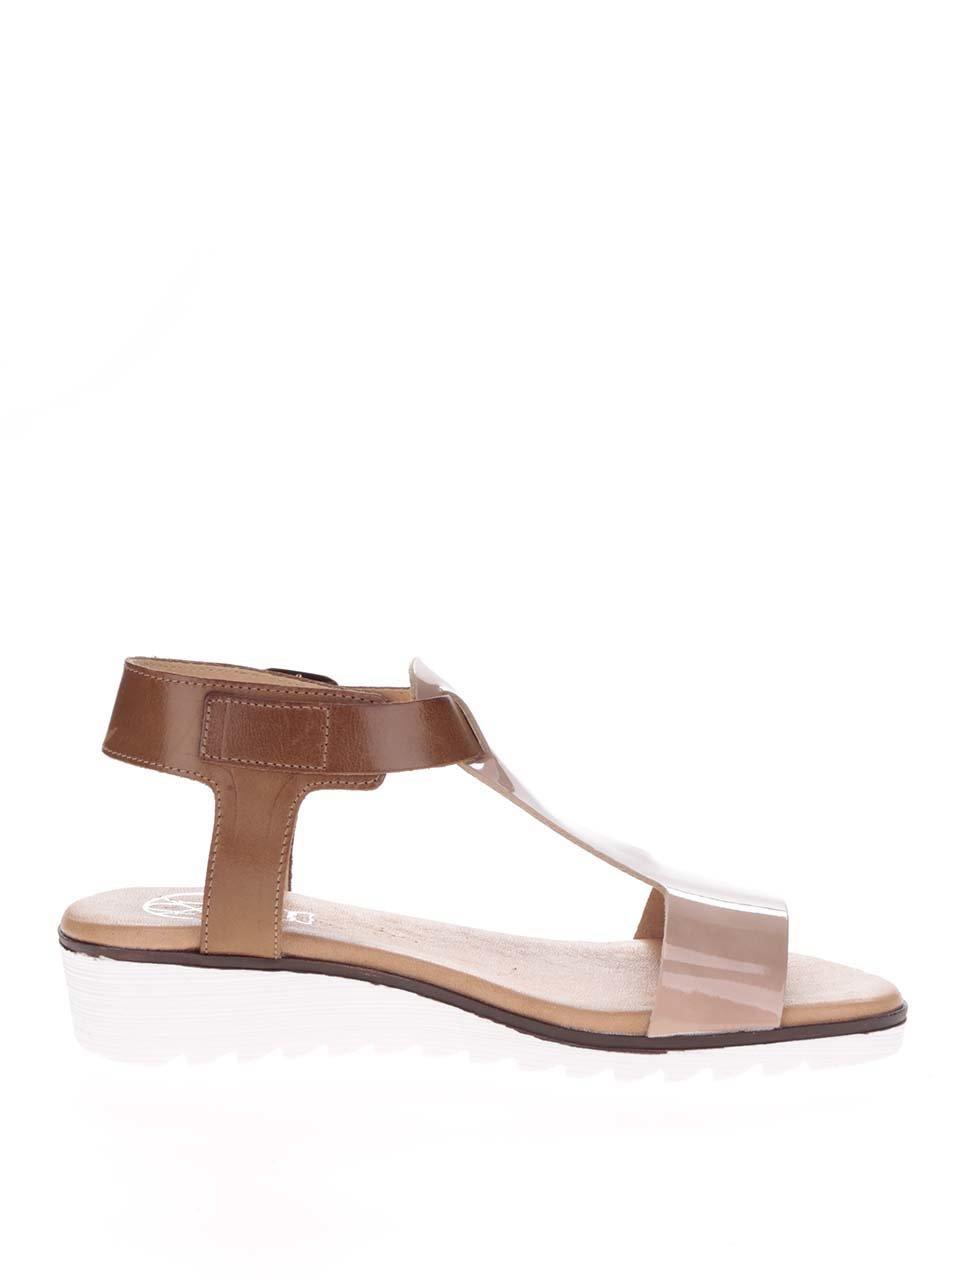 Hnědo-béžové kožené sandály OJJU ... fcfd5300c3